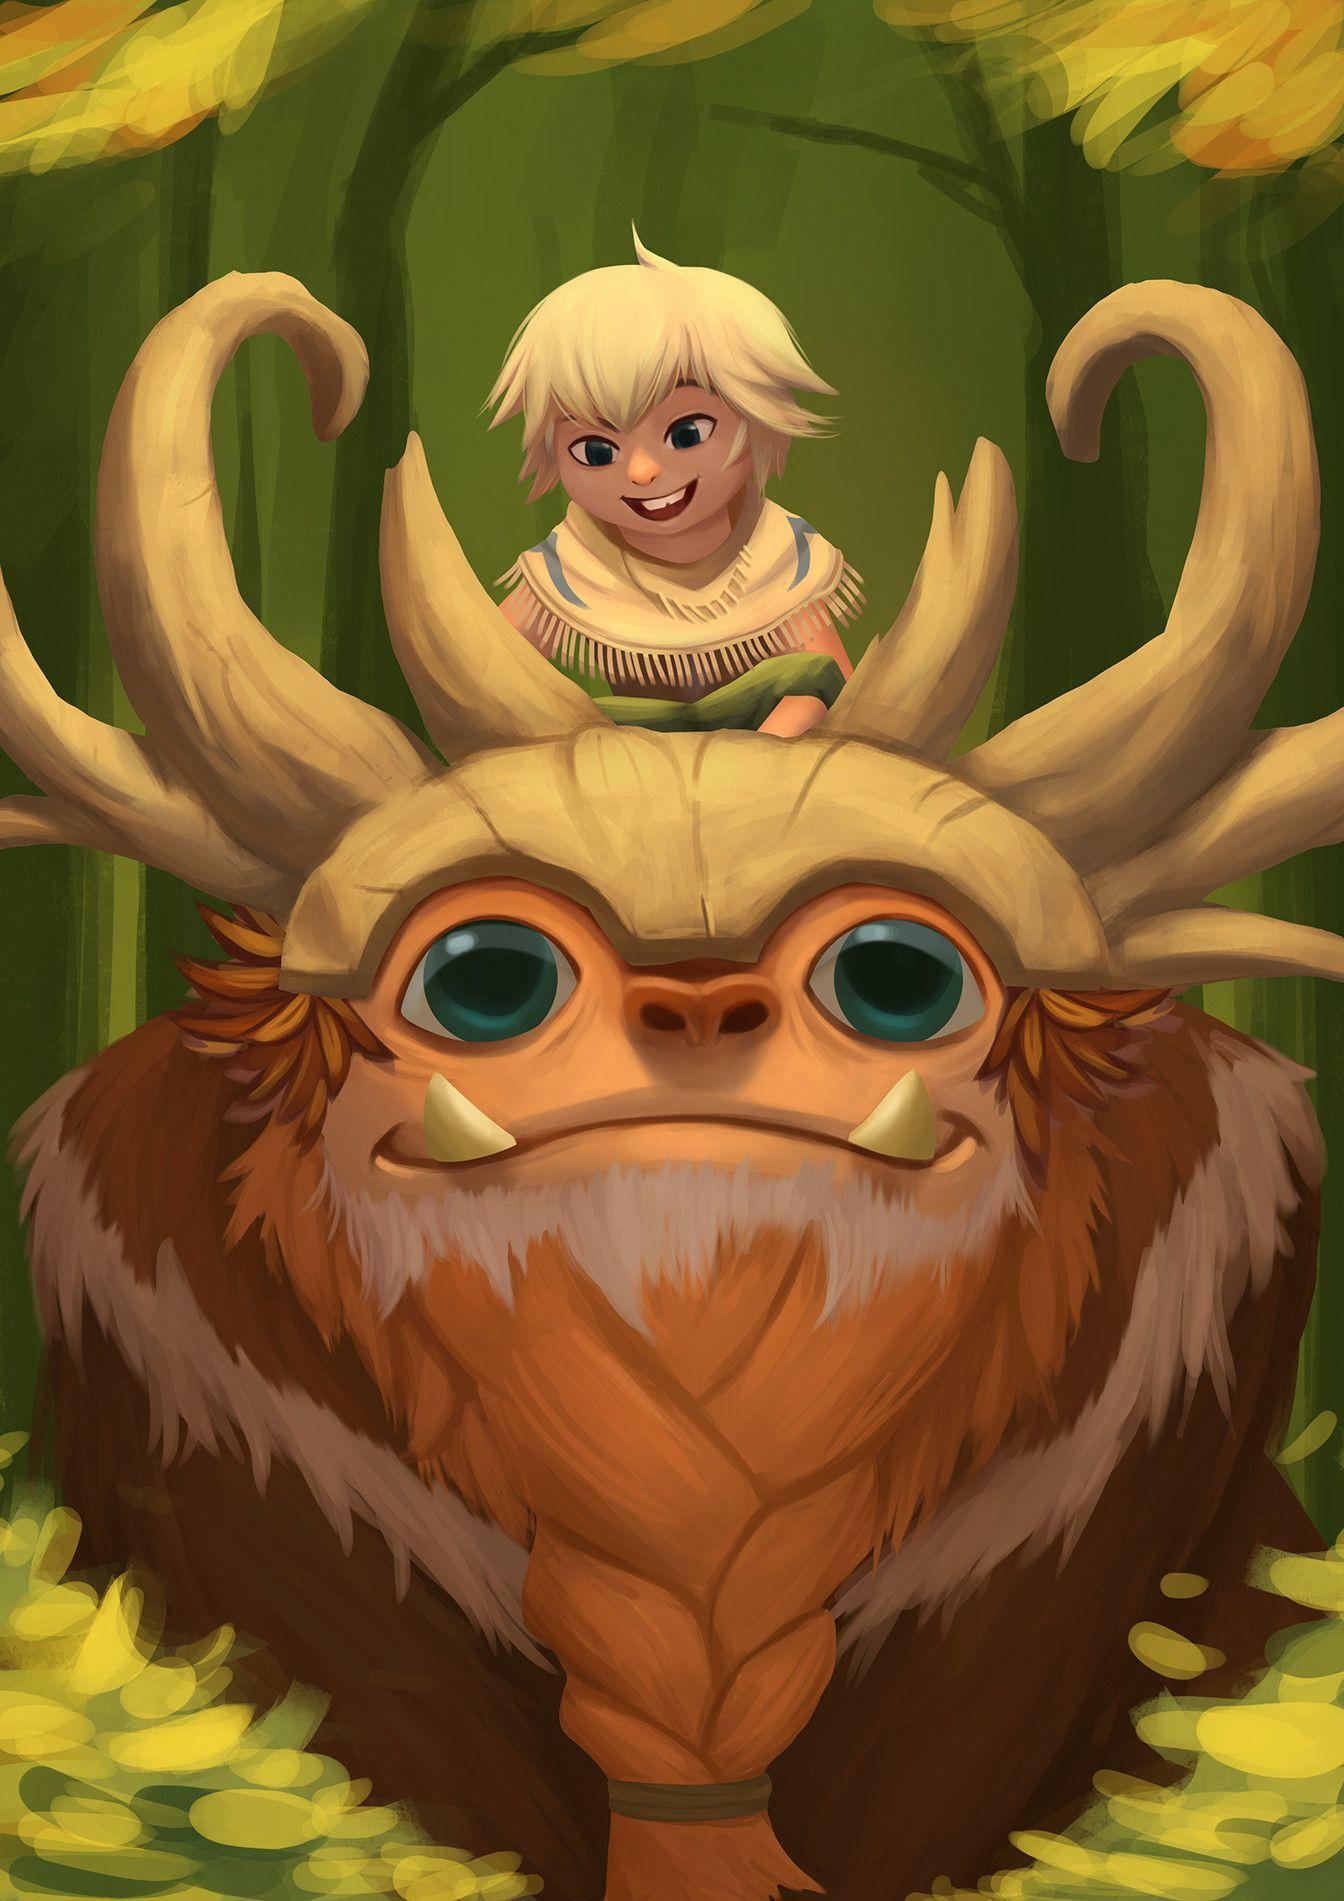 Artstation Sasquatch Nunu And Willump Fanart Pol Mamaril League Of Legends Artwork Fan Art